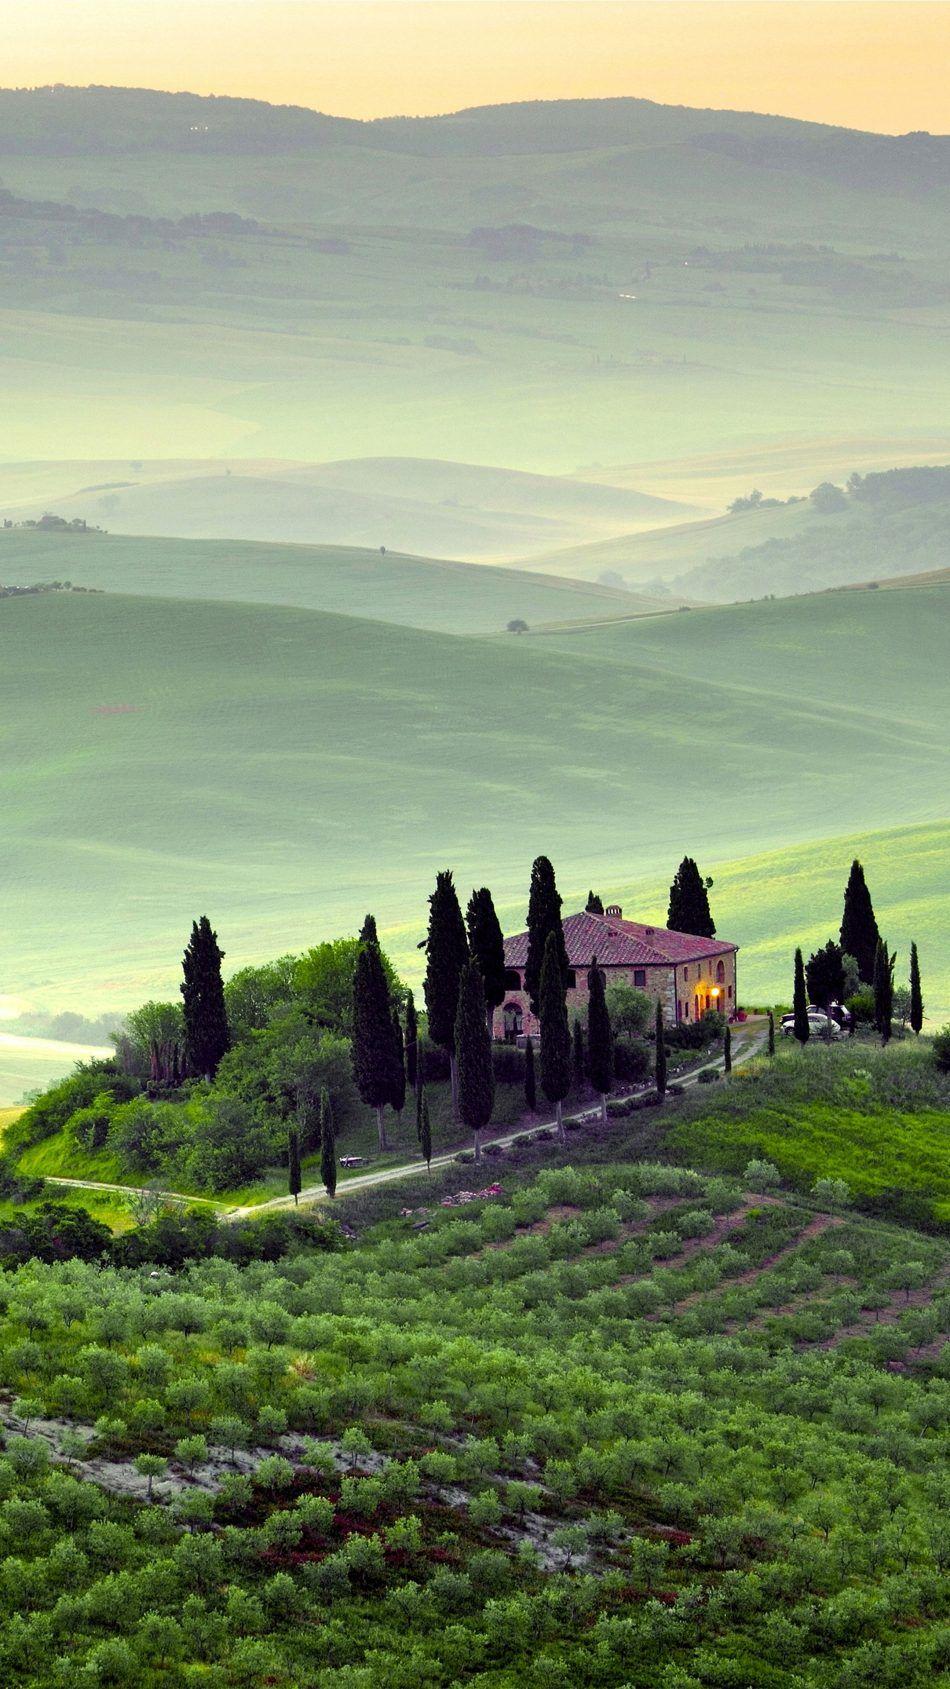 Tuscany Italy Landscape 4k Ultra Hd Mobile Wallpaper Italy Landscape Tuscany Landscape Italy Travel